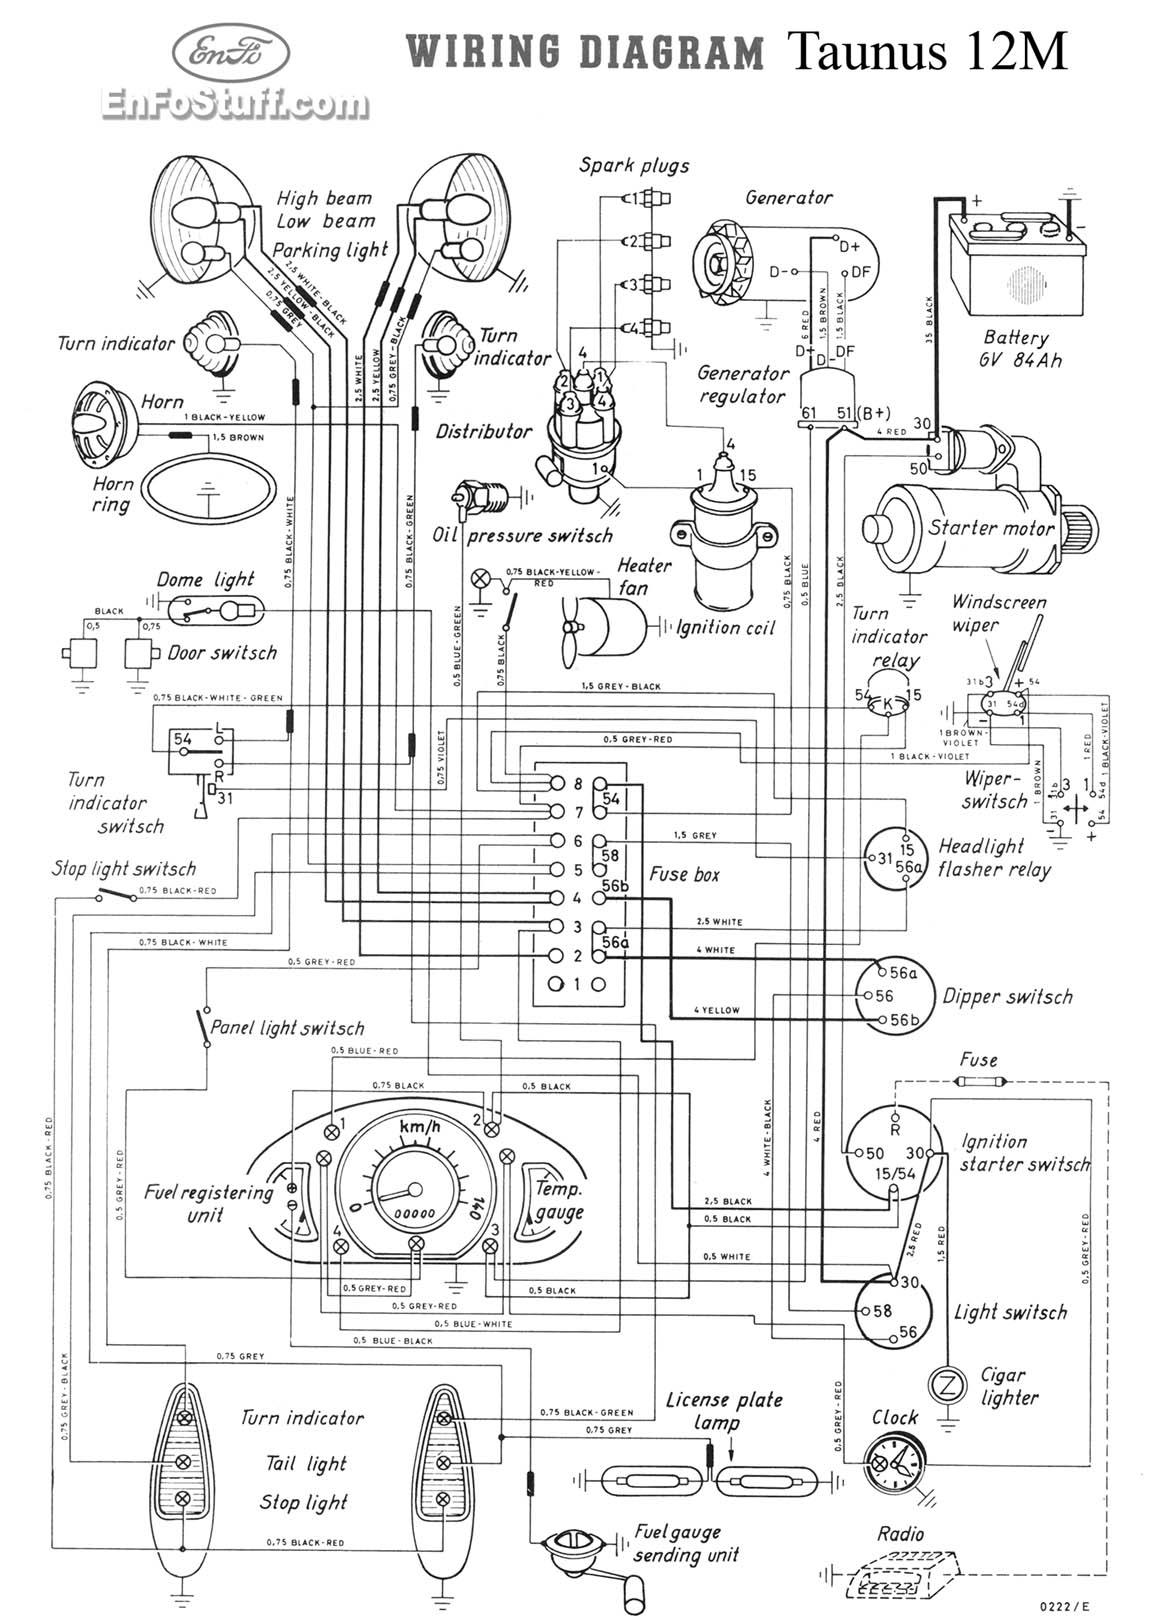 2004 Volvo S40 Wiring Diagrams On 2000 Jaguar S Type Wiring Diagrams